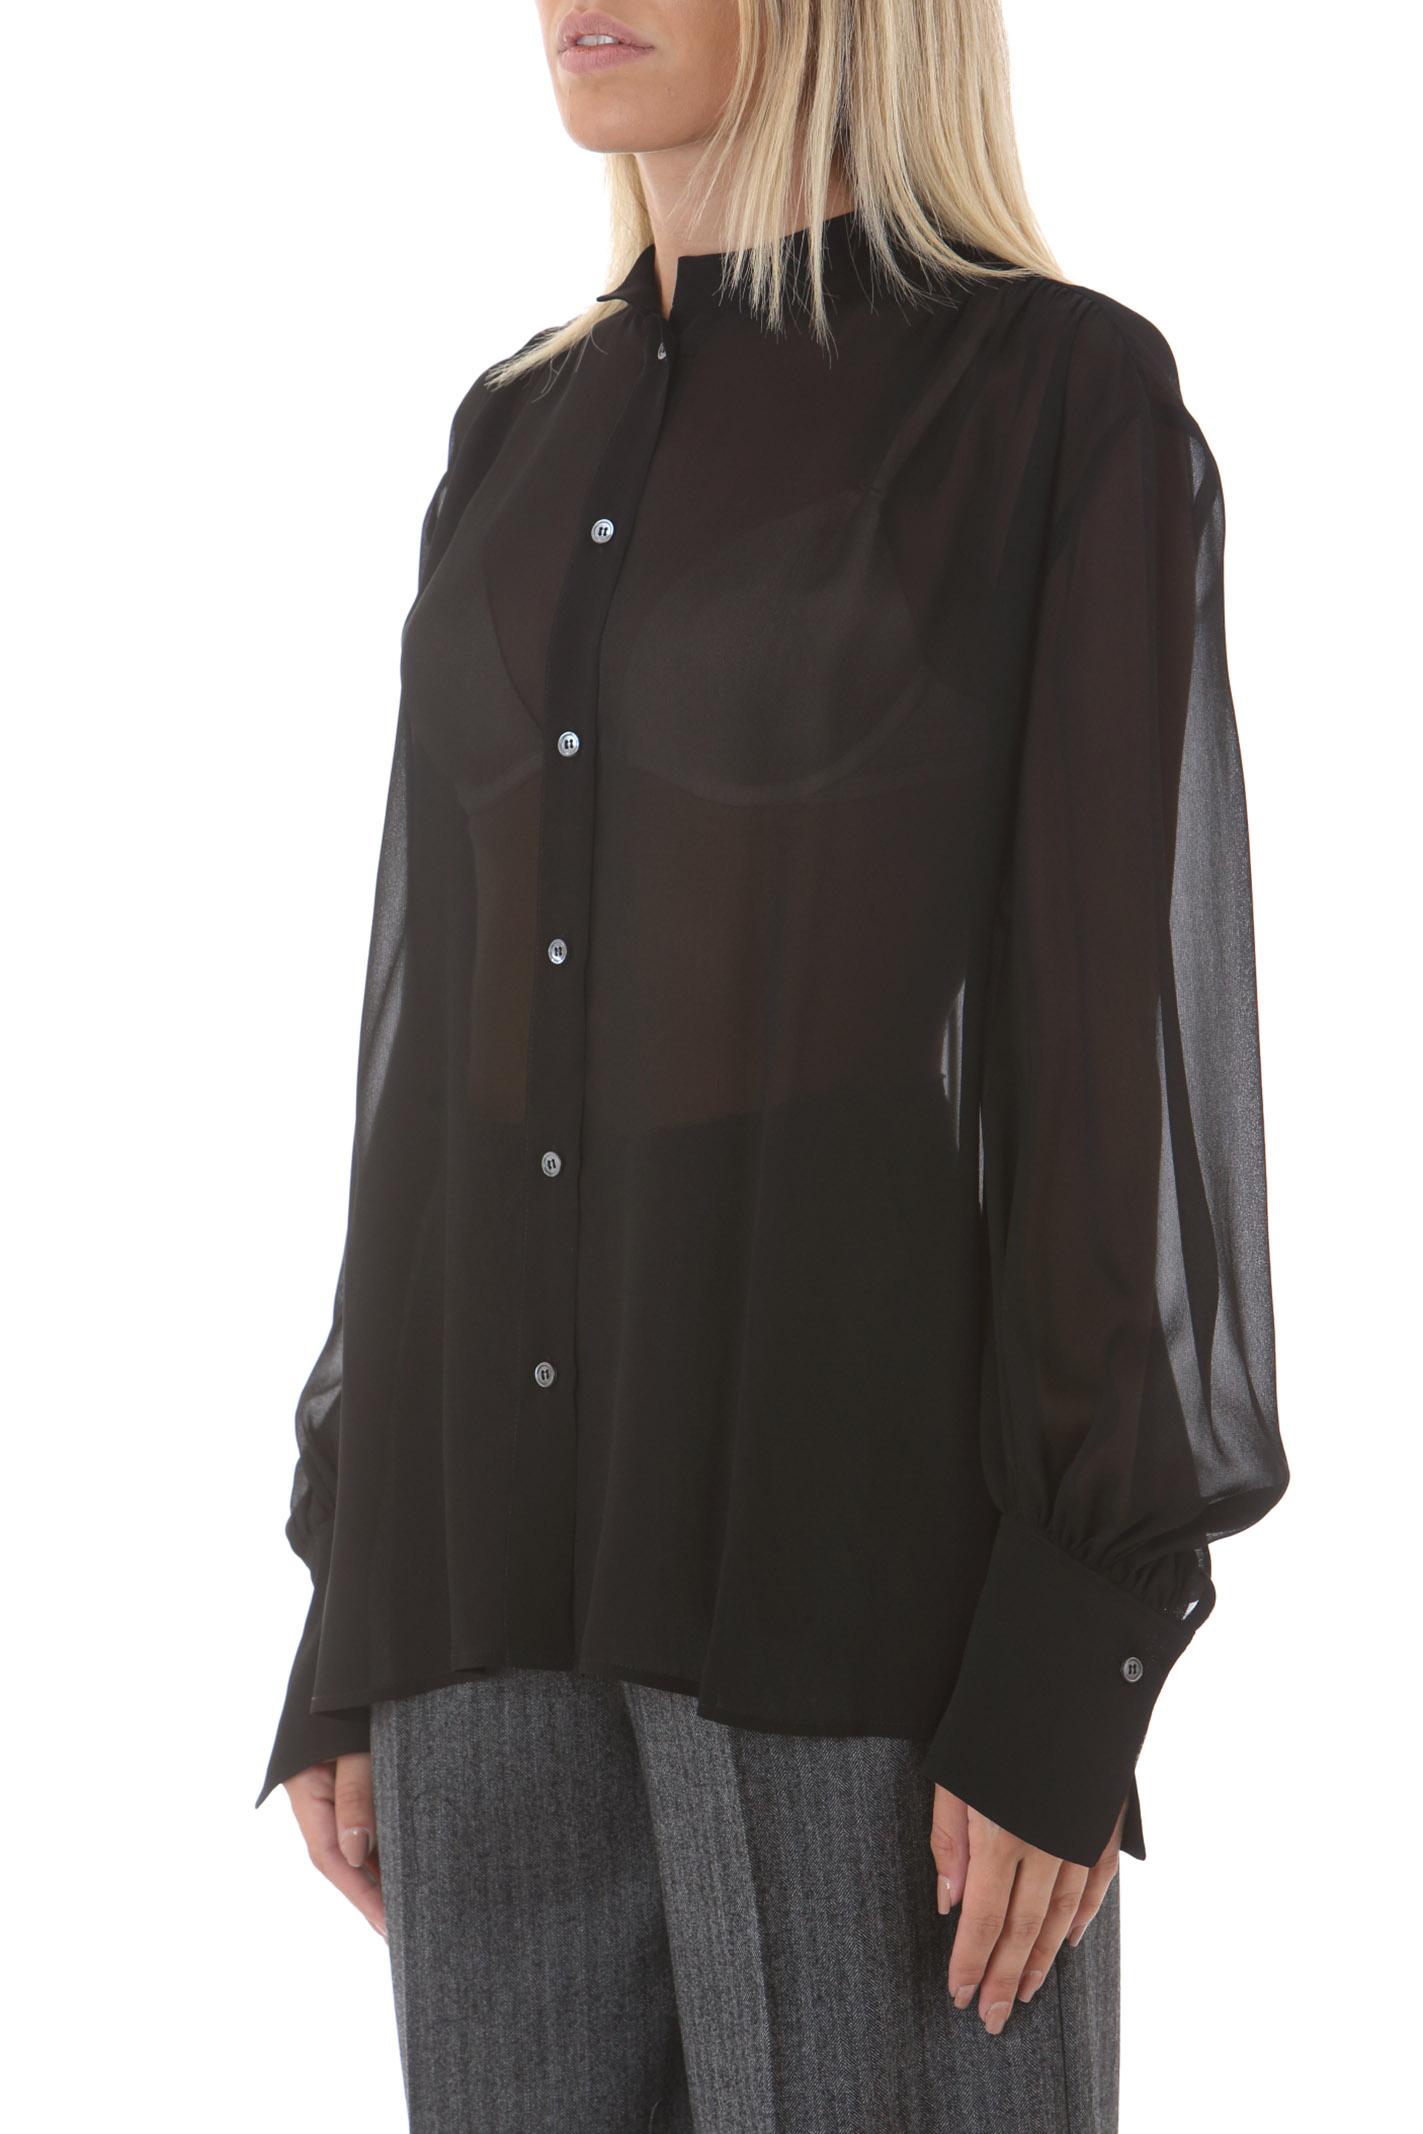 Top donna con arricci sulle spalle GRIFONI | Camicie | GL220071/8003